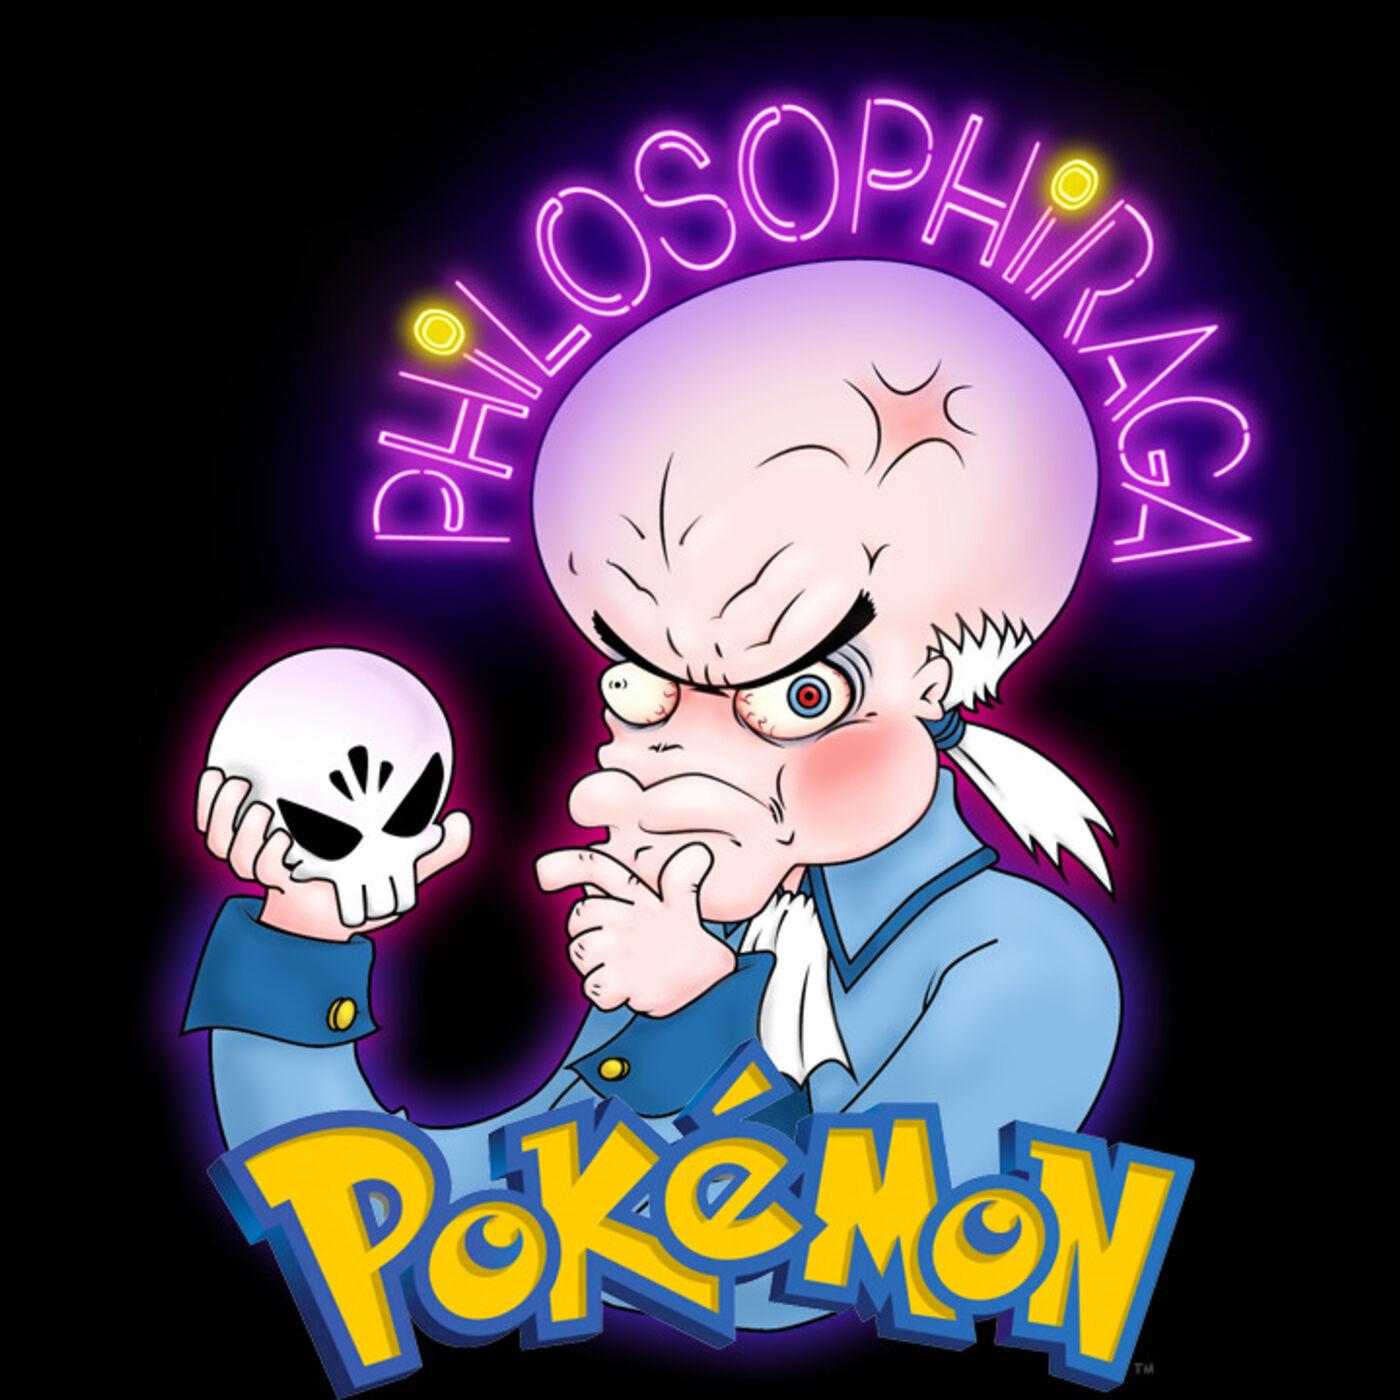 M2E1: It's Super Effective! (Pokémon and Justified True Belief)